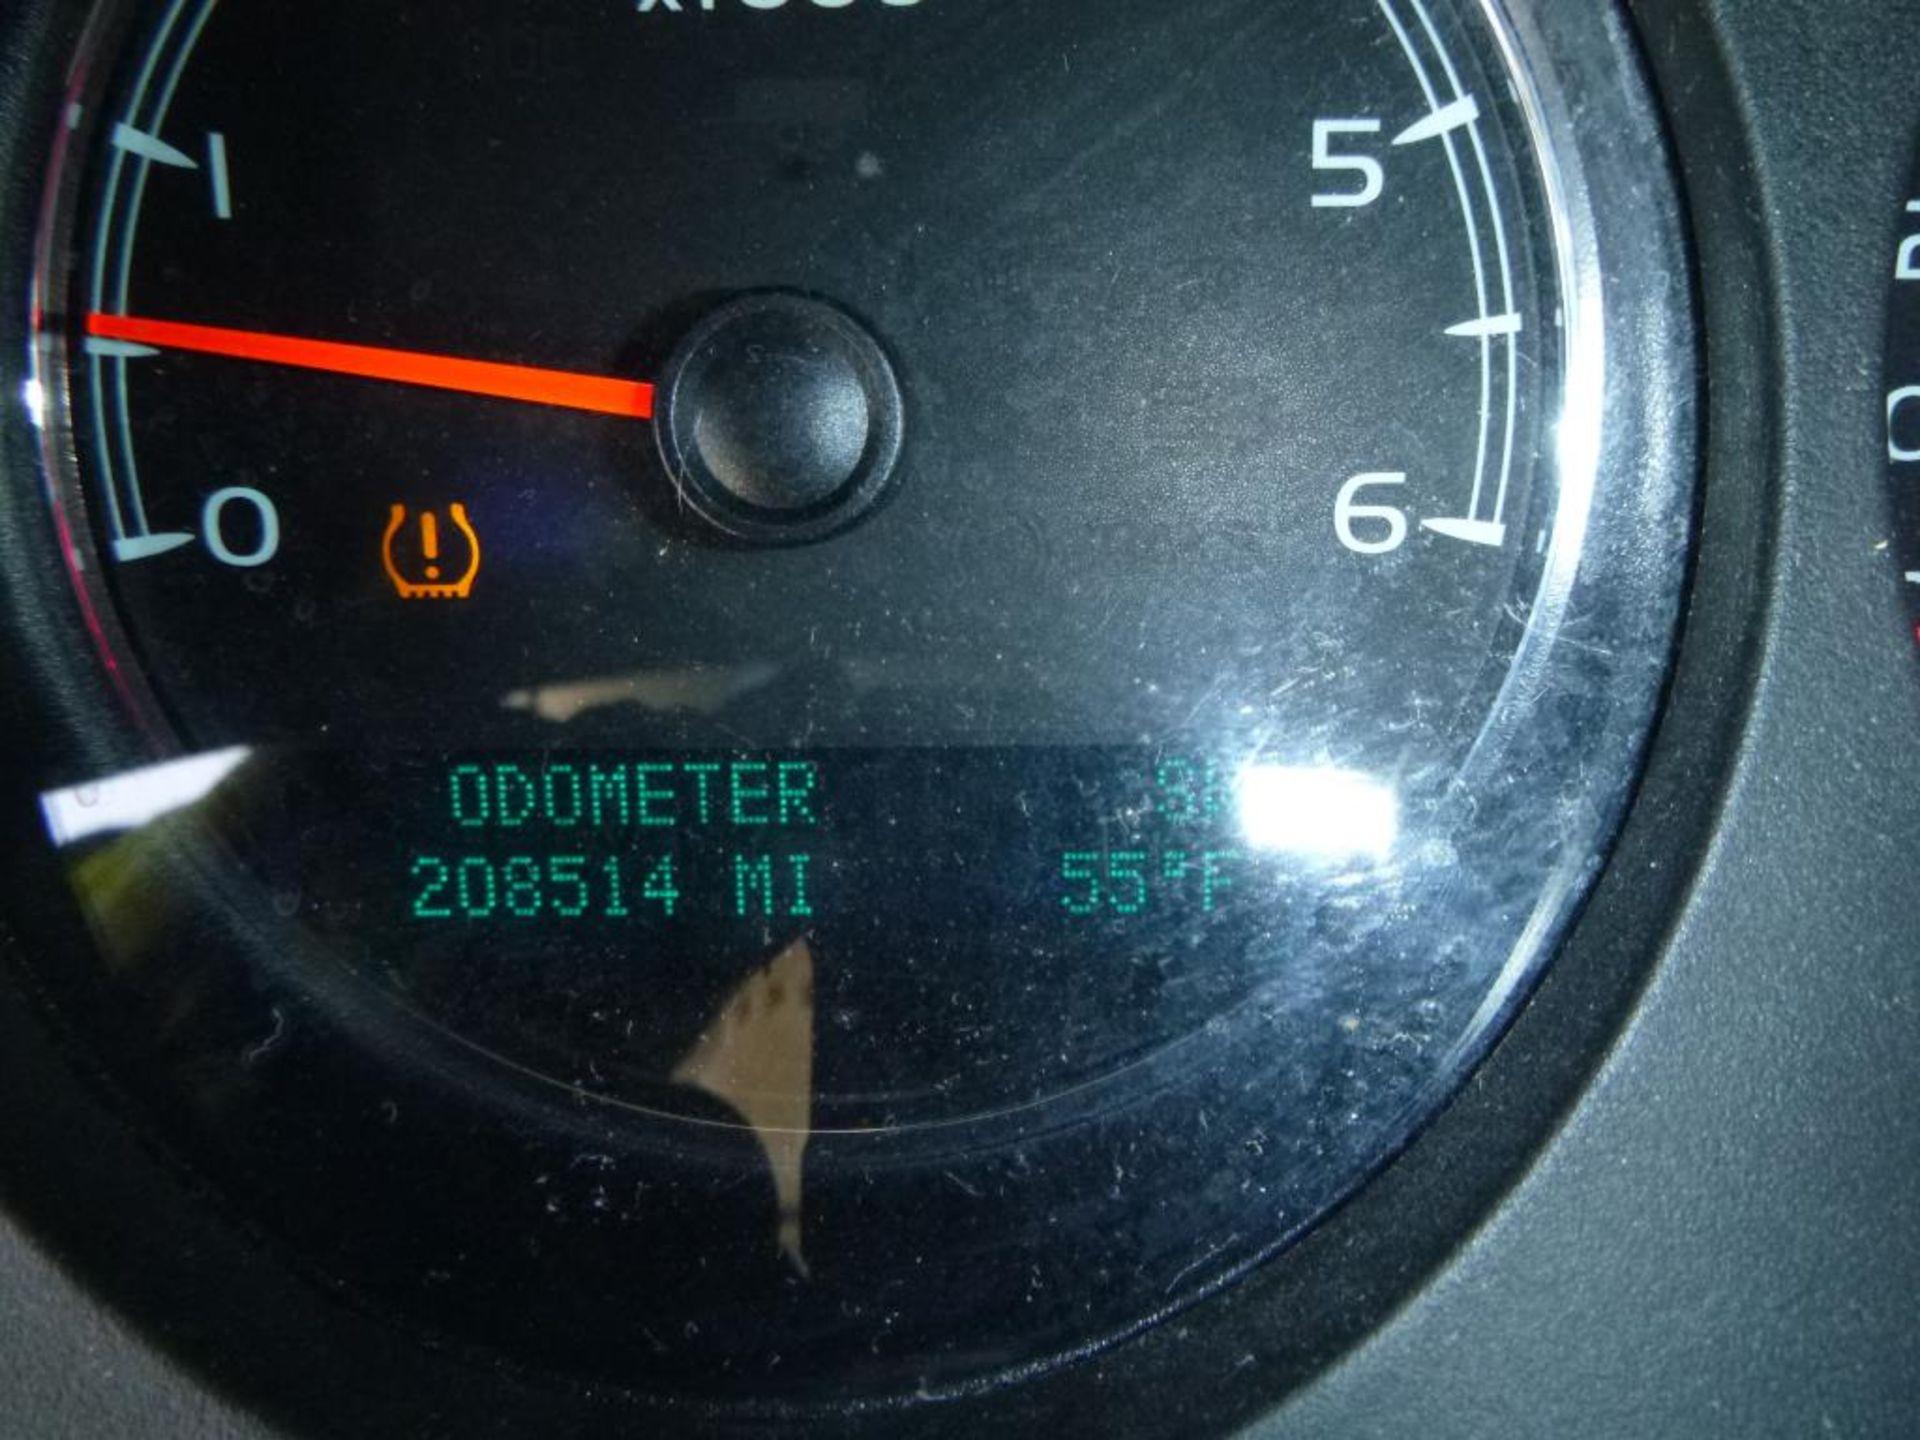 2010 GMC Yukon - Image 13 of 14